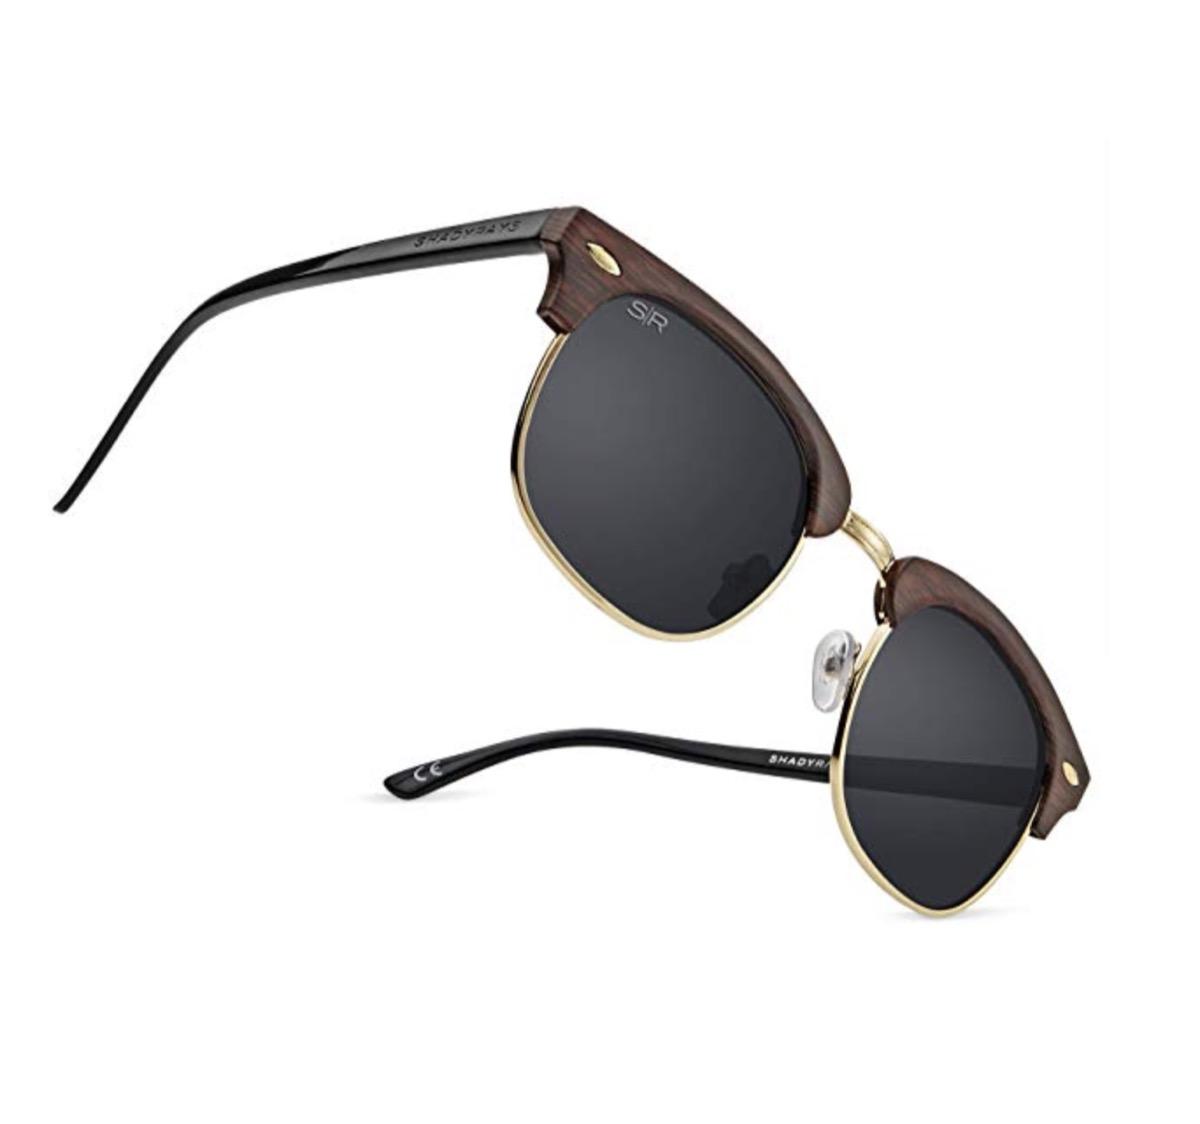 shadys rays sunglasses